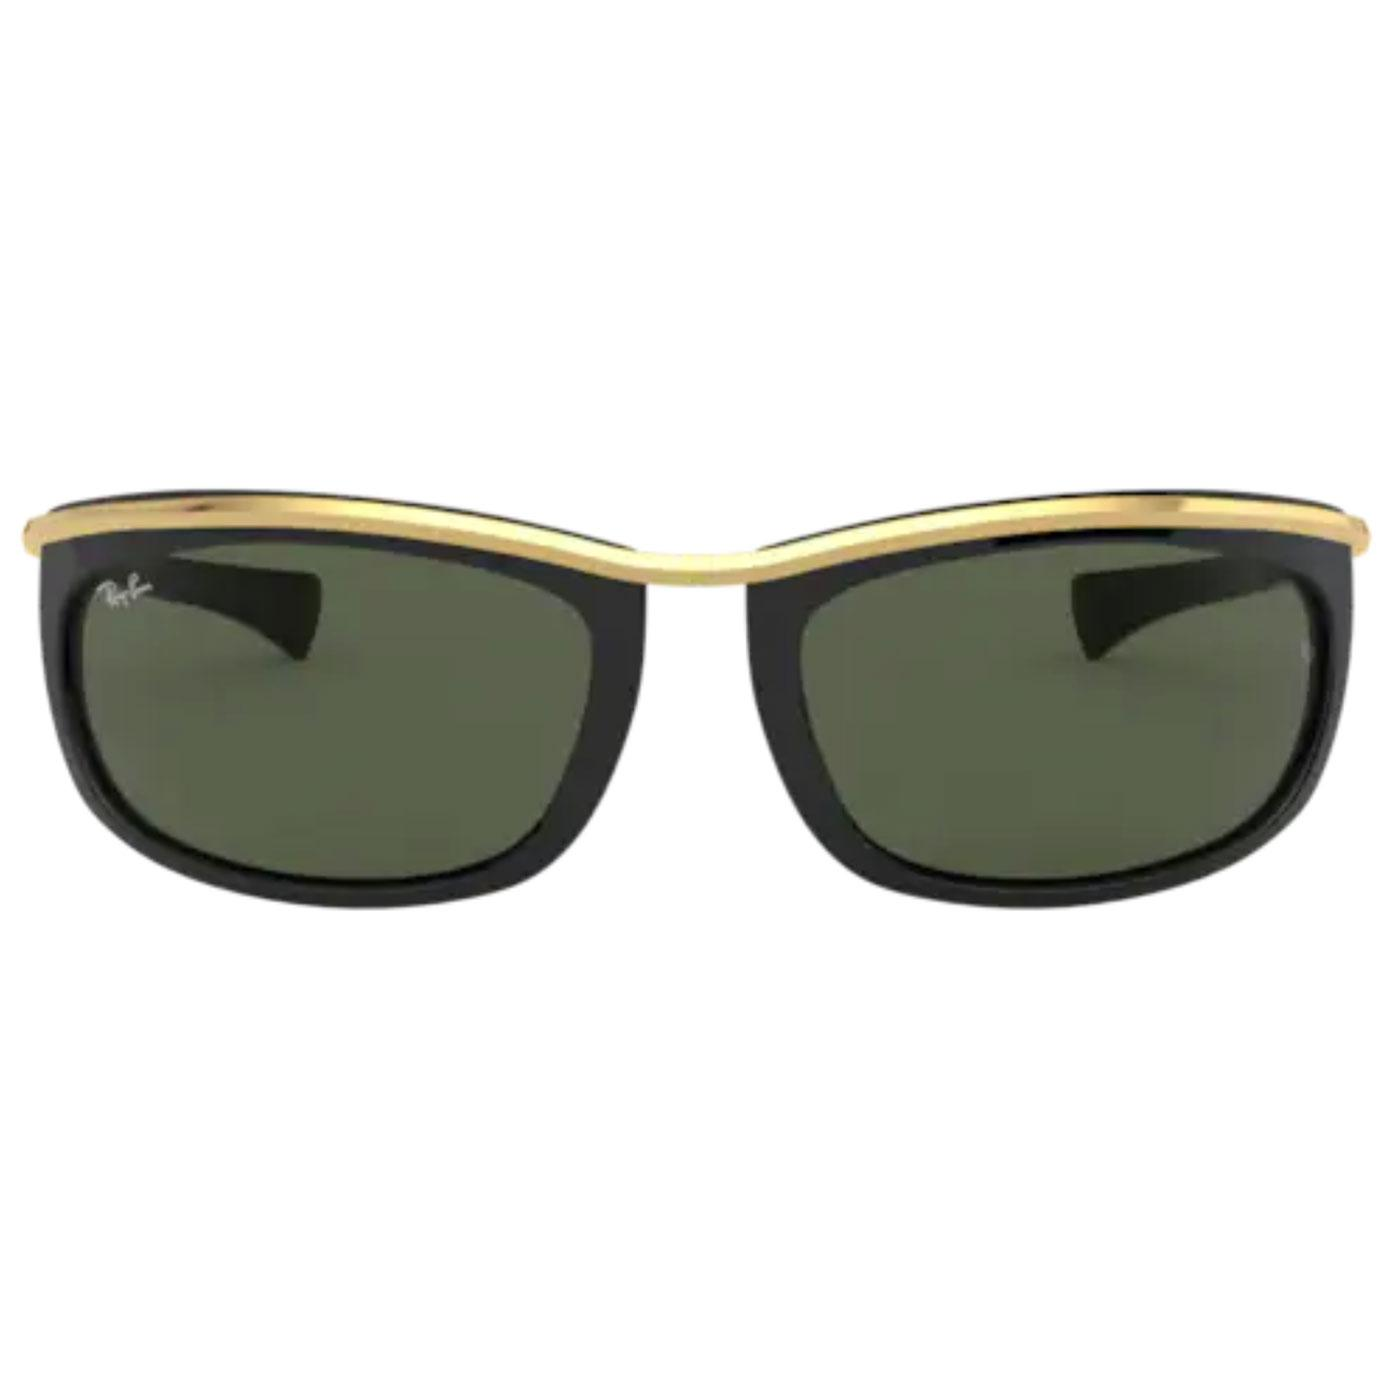 Olympian RAY-BAN Retro 60s Sunglasses in Black